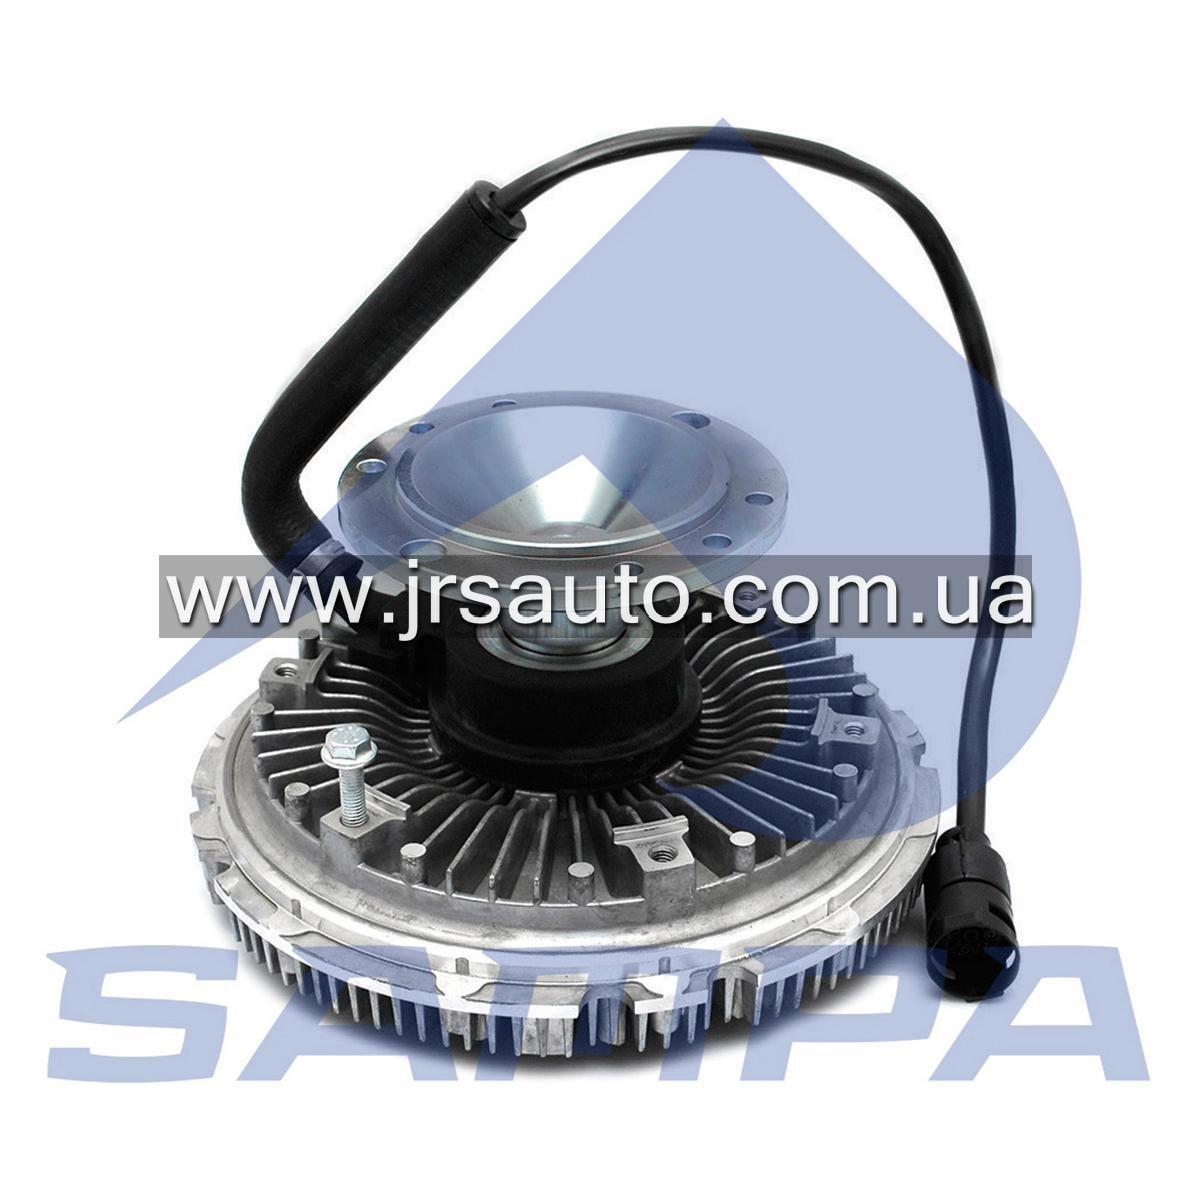 Вискомуфта вентилятора (гидромуфта, вентилятор охлаждение двигателя) DAF F95 / 95XF / XF95 (d233 mm) \1427573 \ 051.022